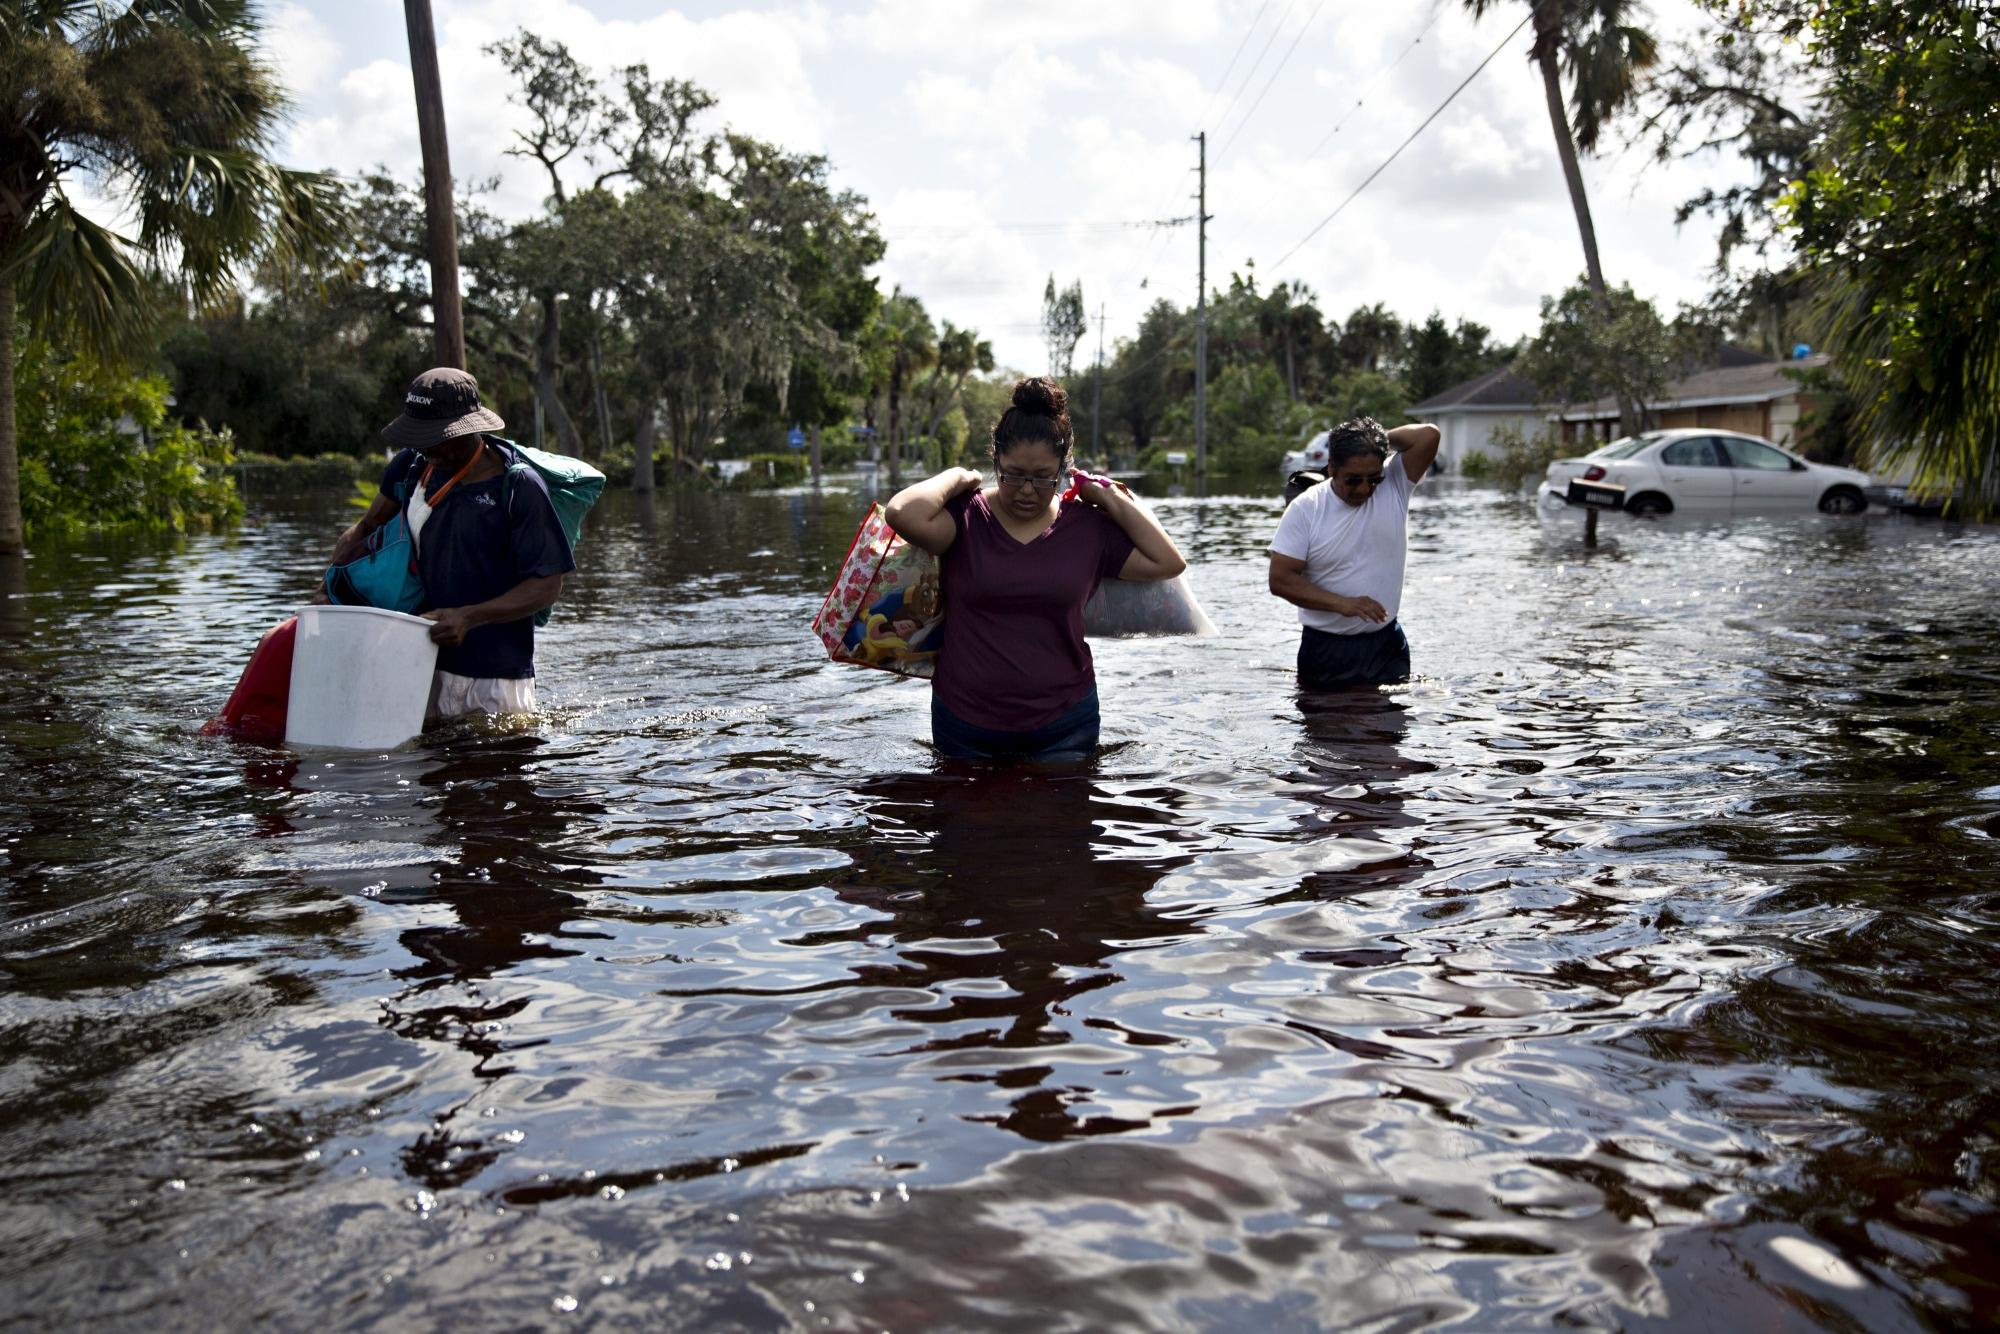 Hurricane Irma Pass in Bonita Springs, Florida | Image: Daniel Acker / Bloomberg